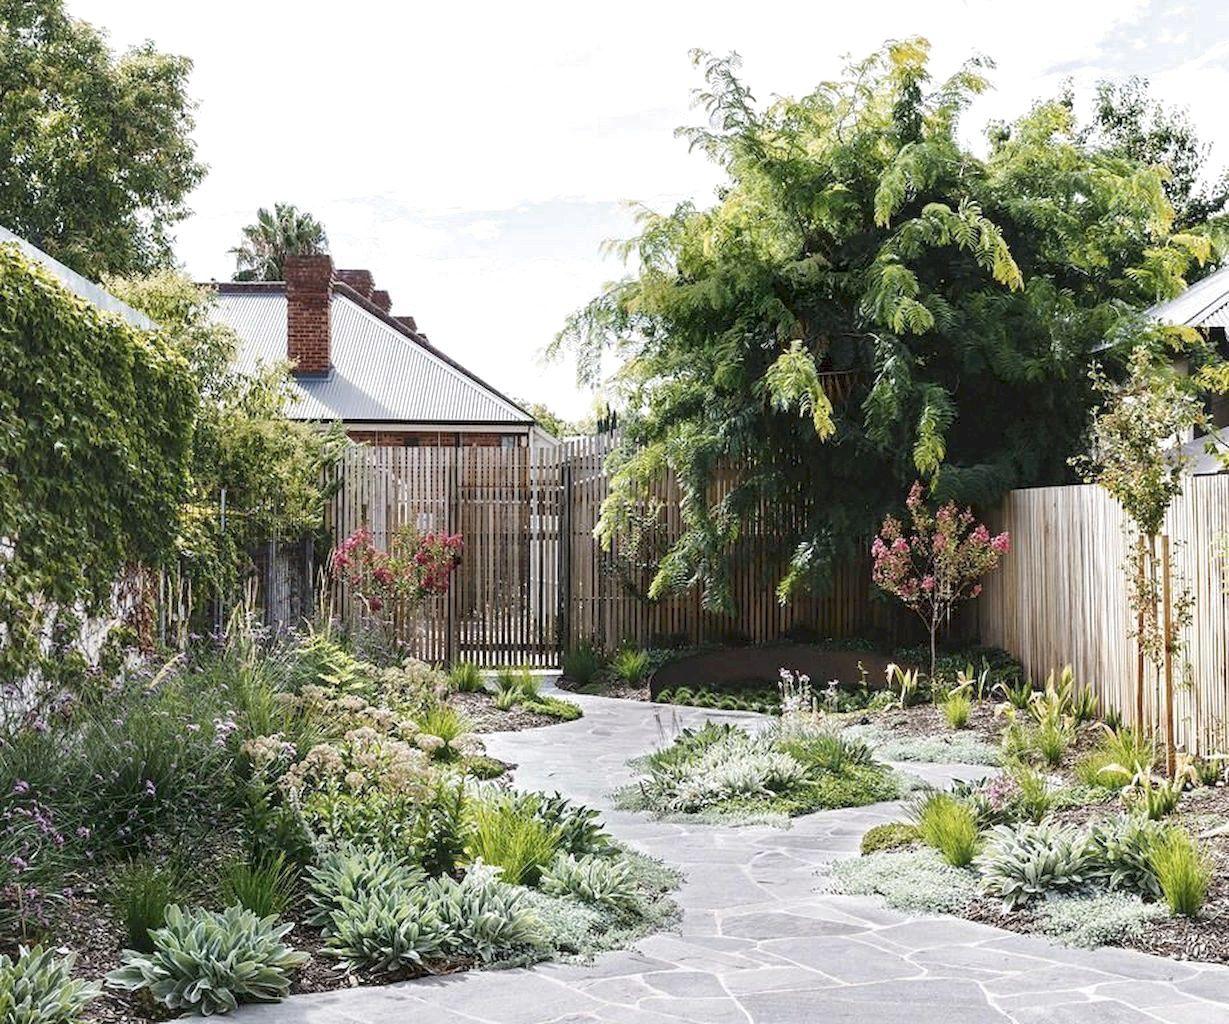 Favorite Side House Garden Landscaping Decoration Ideas With Rocks Exp Decor In 2020 Cottage Garden Urban Garden Landscape Decor